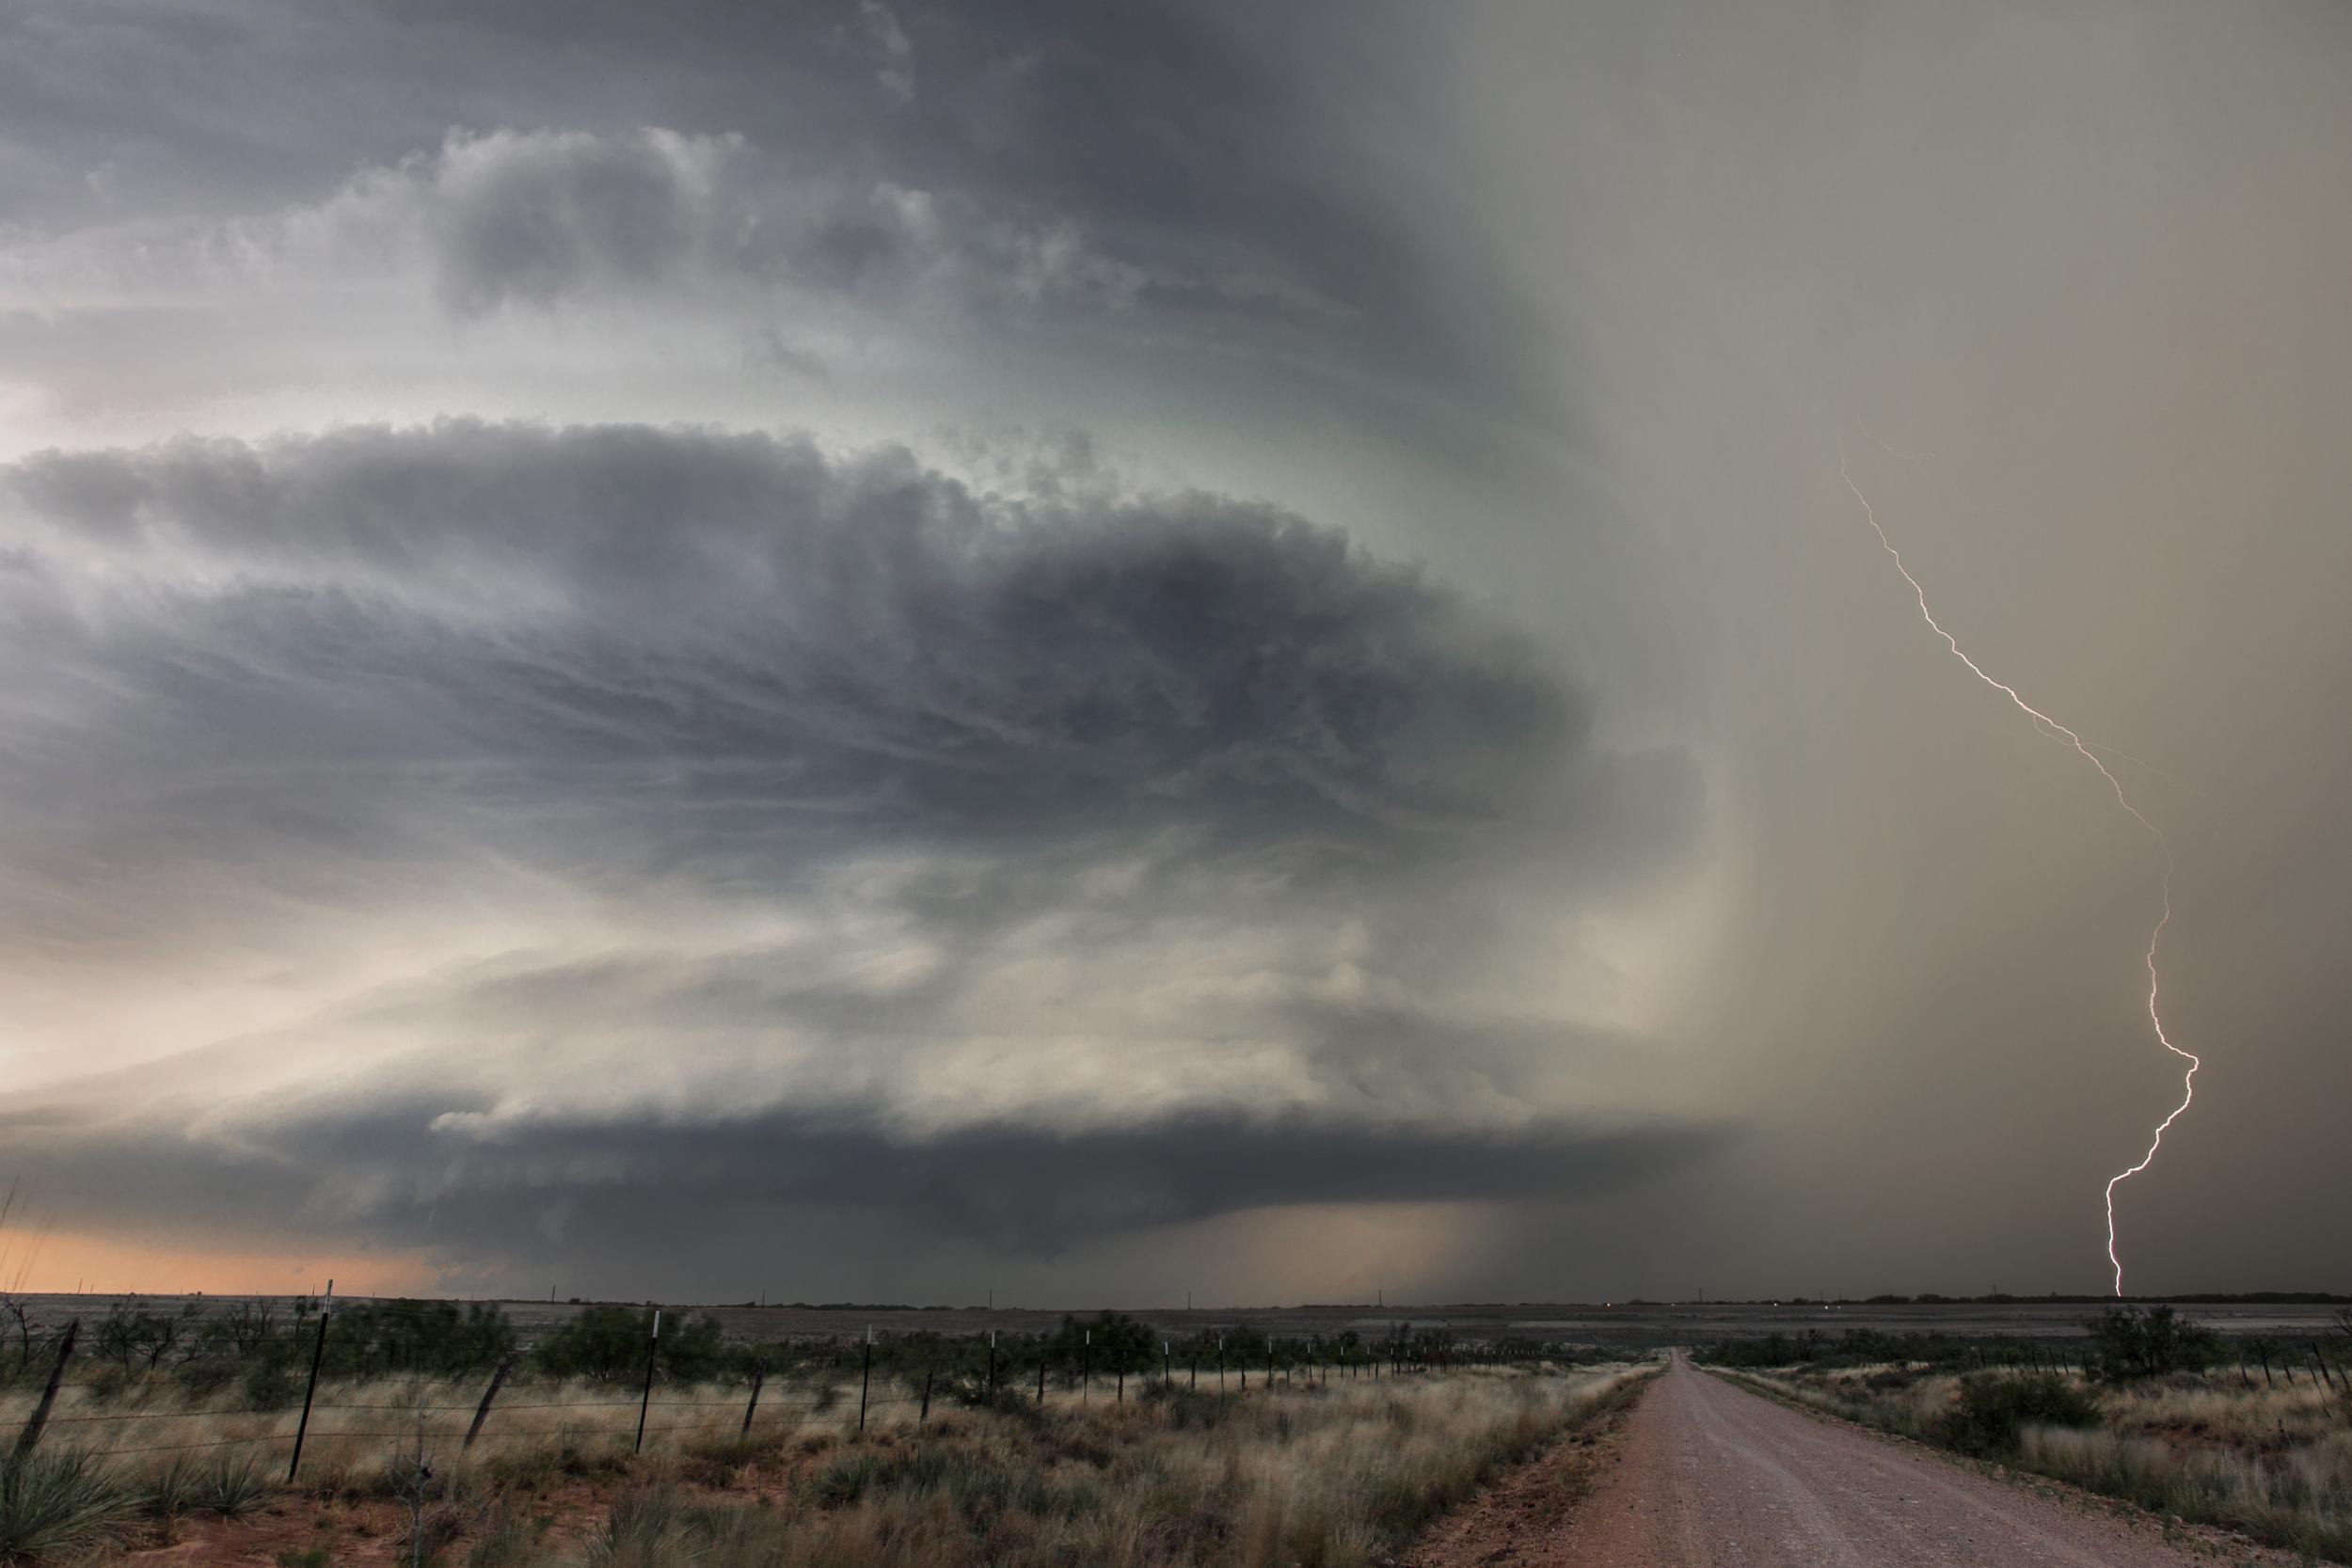 Mesocyclone and lightning near Waurika, Oklahoma on May 7, 2014